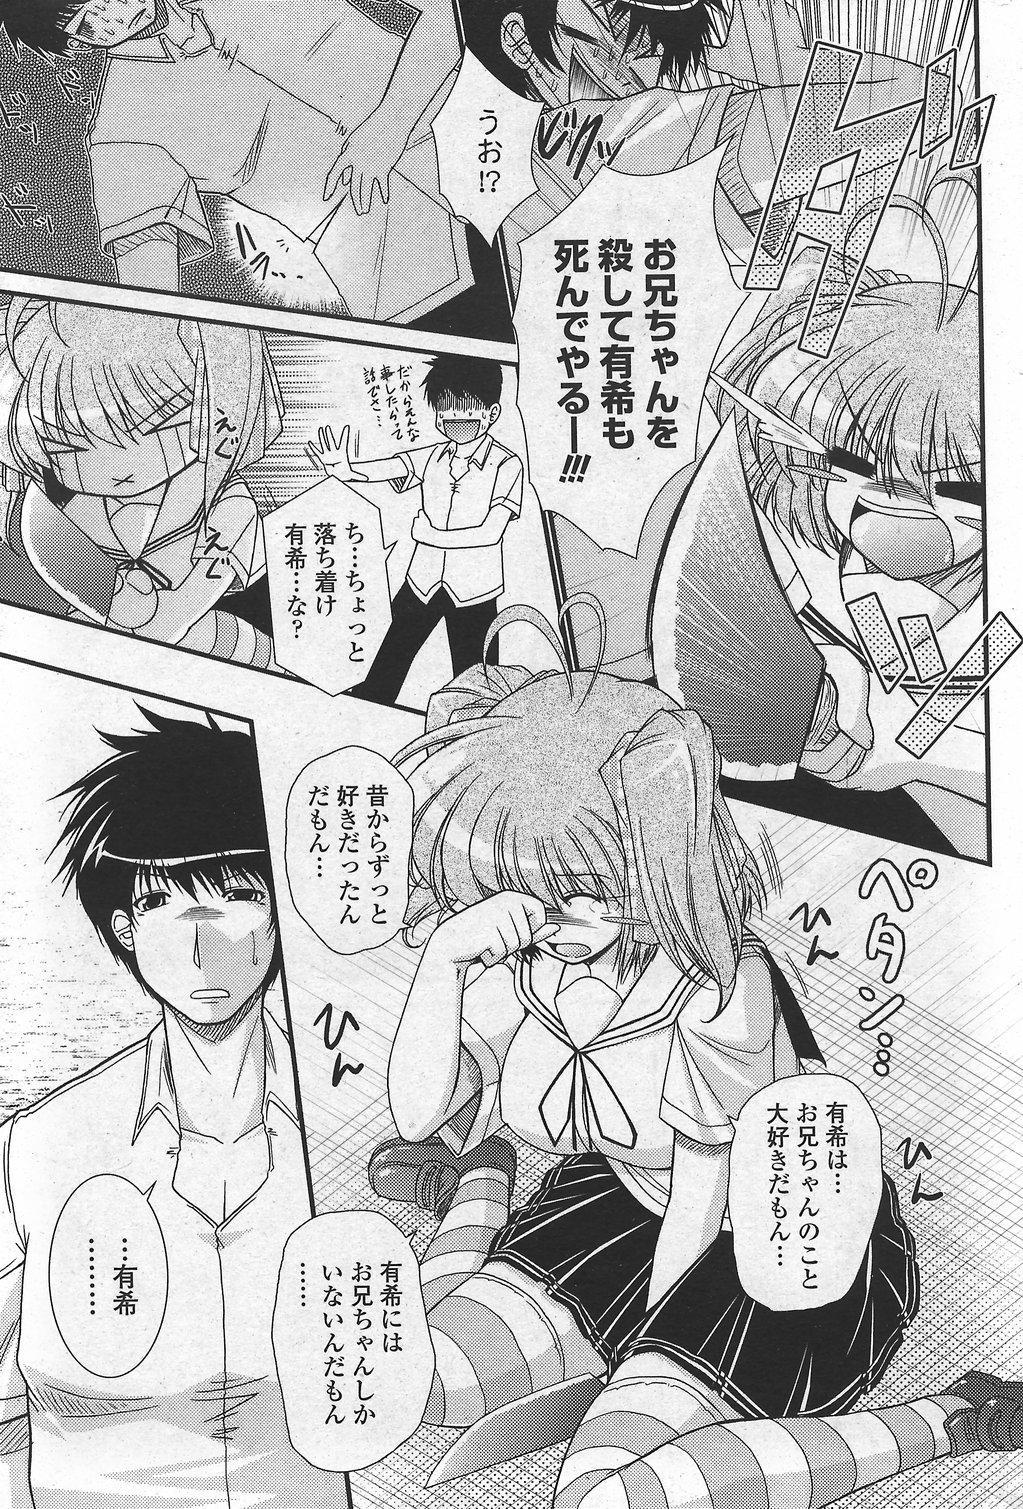 COMIC Penguin Club Sanzokuban 2007-10 Vol. 225 60